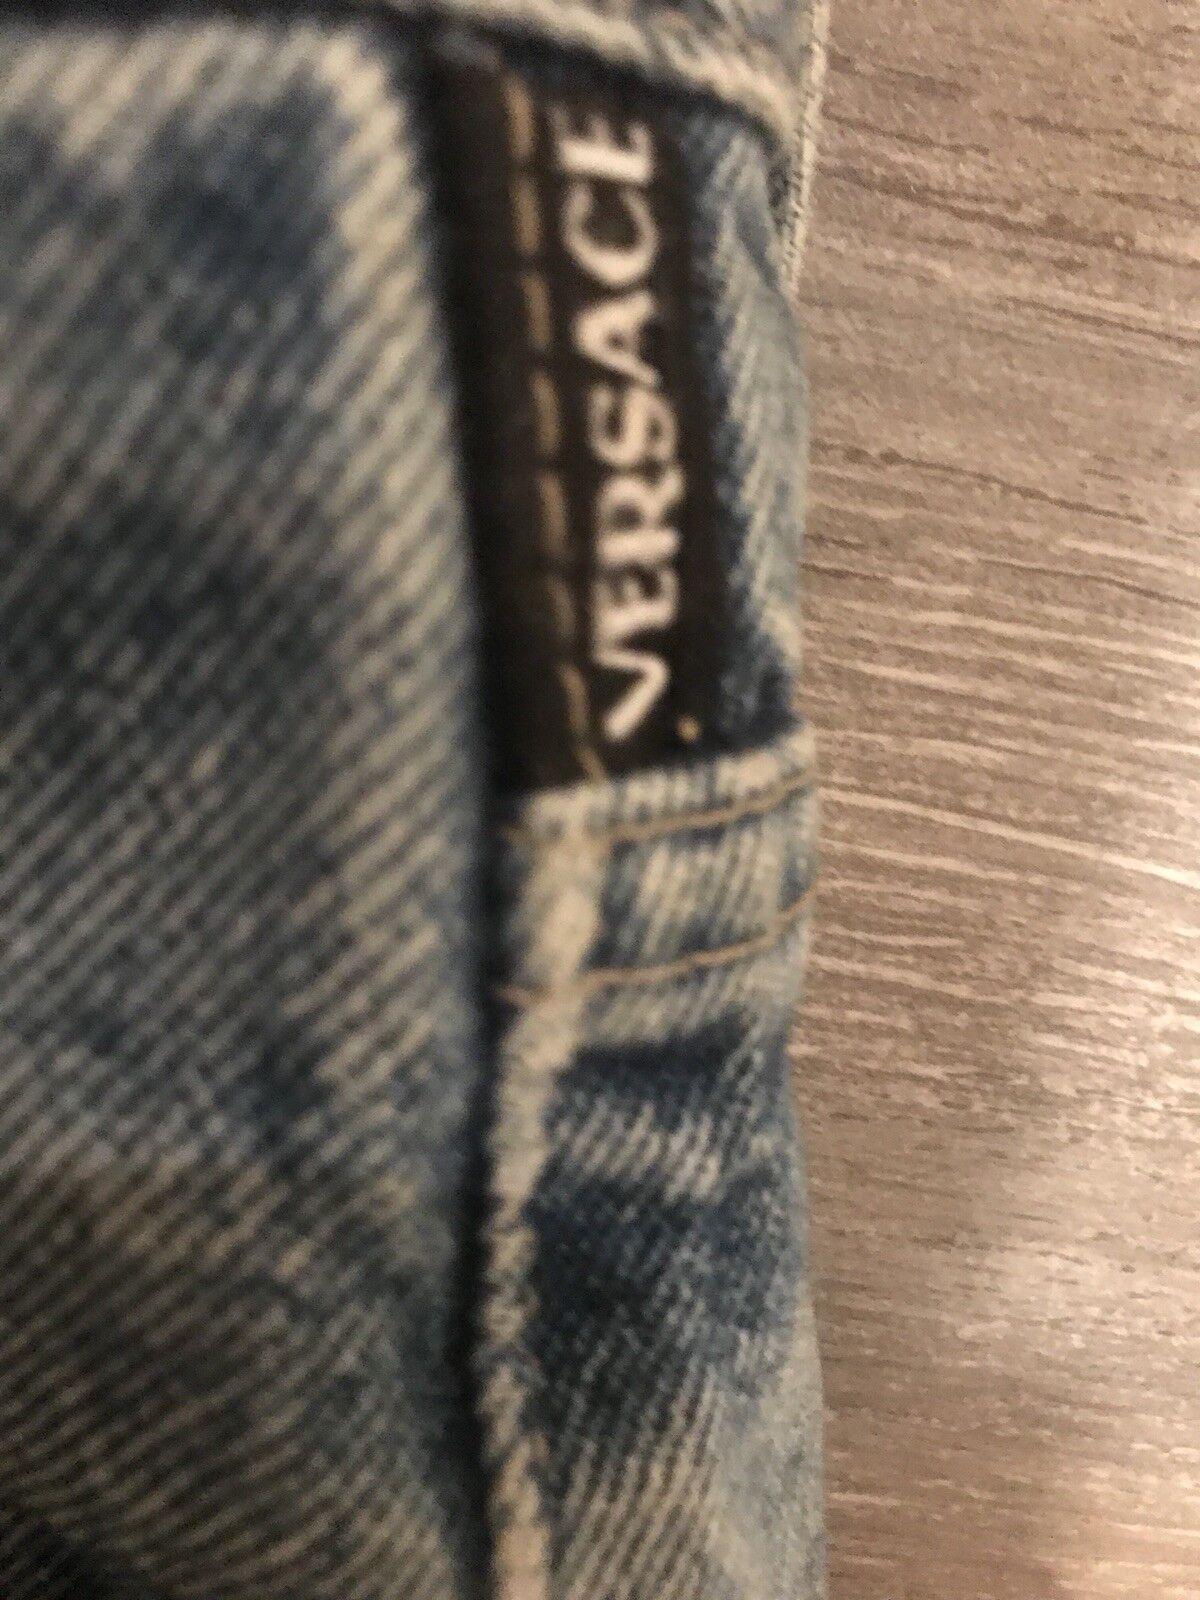 OG presto Versace Jeans Taglia Taglia Taglia 34 6b7eb5